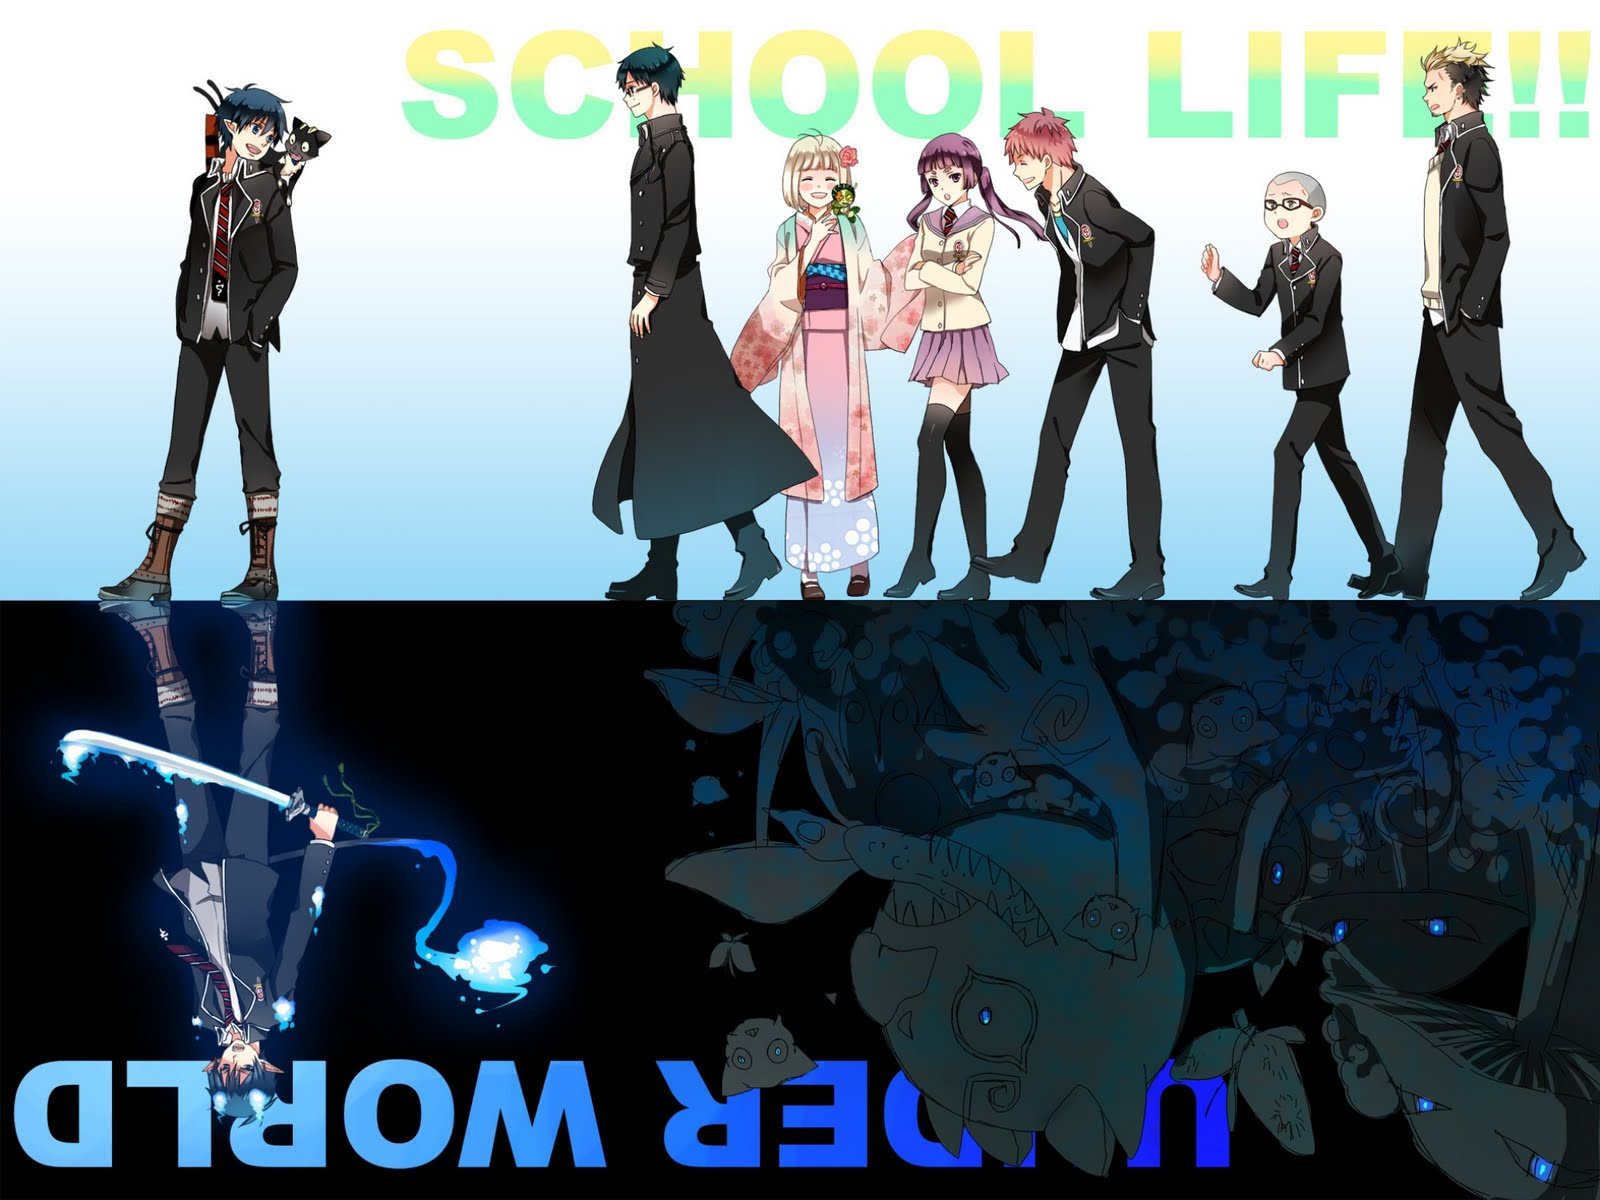 http://2.bp.blogspot.com/-D-6h1iJhifA/TfXfE6BmnYI/AAAAAAAAAJ4/cht0ZnHk9Es/s1600/AoNoExorcist_25.jpg